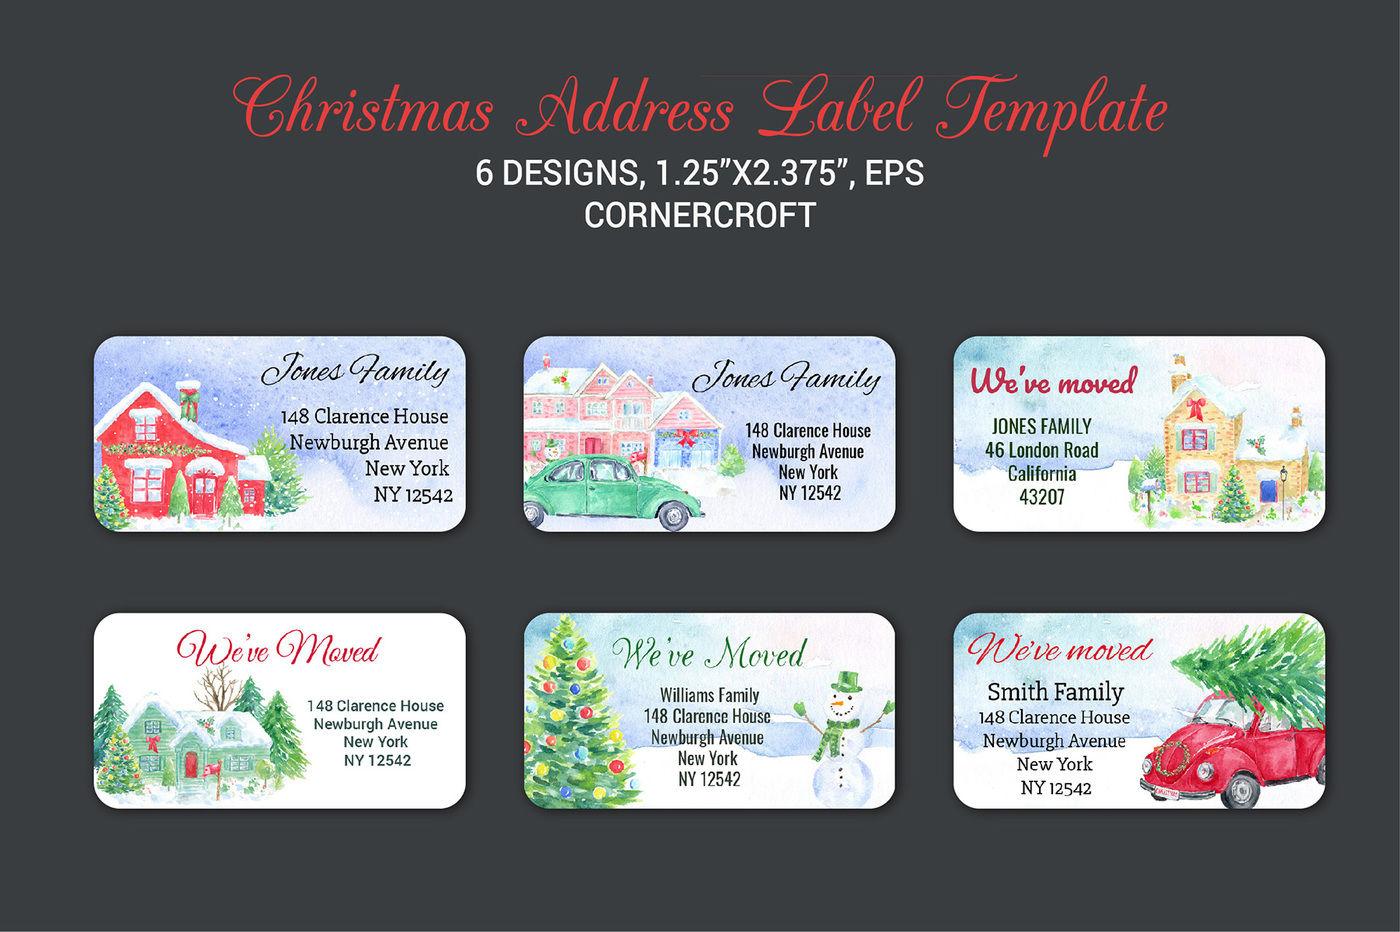 Christmas Address Label Template By Cornercroft Thehungryjpeg Com